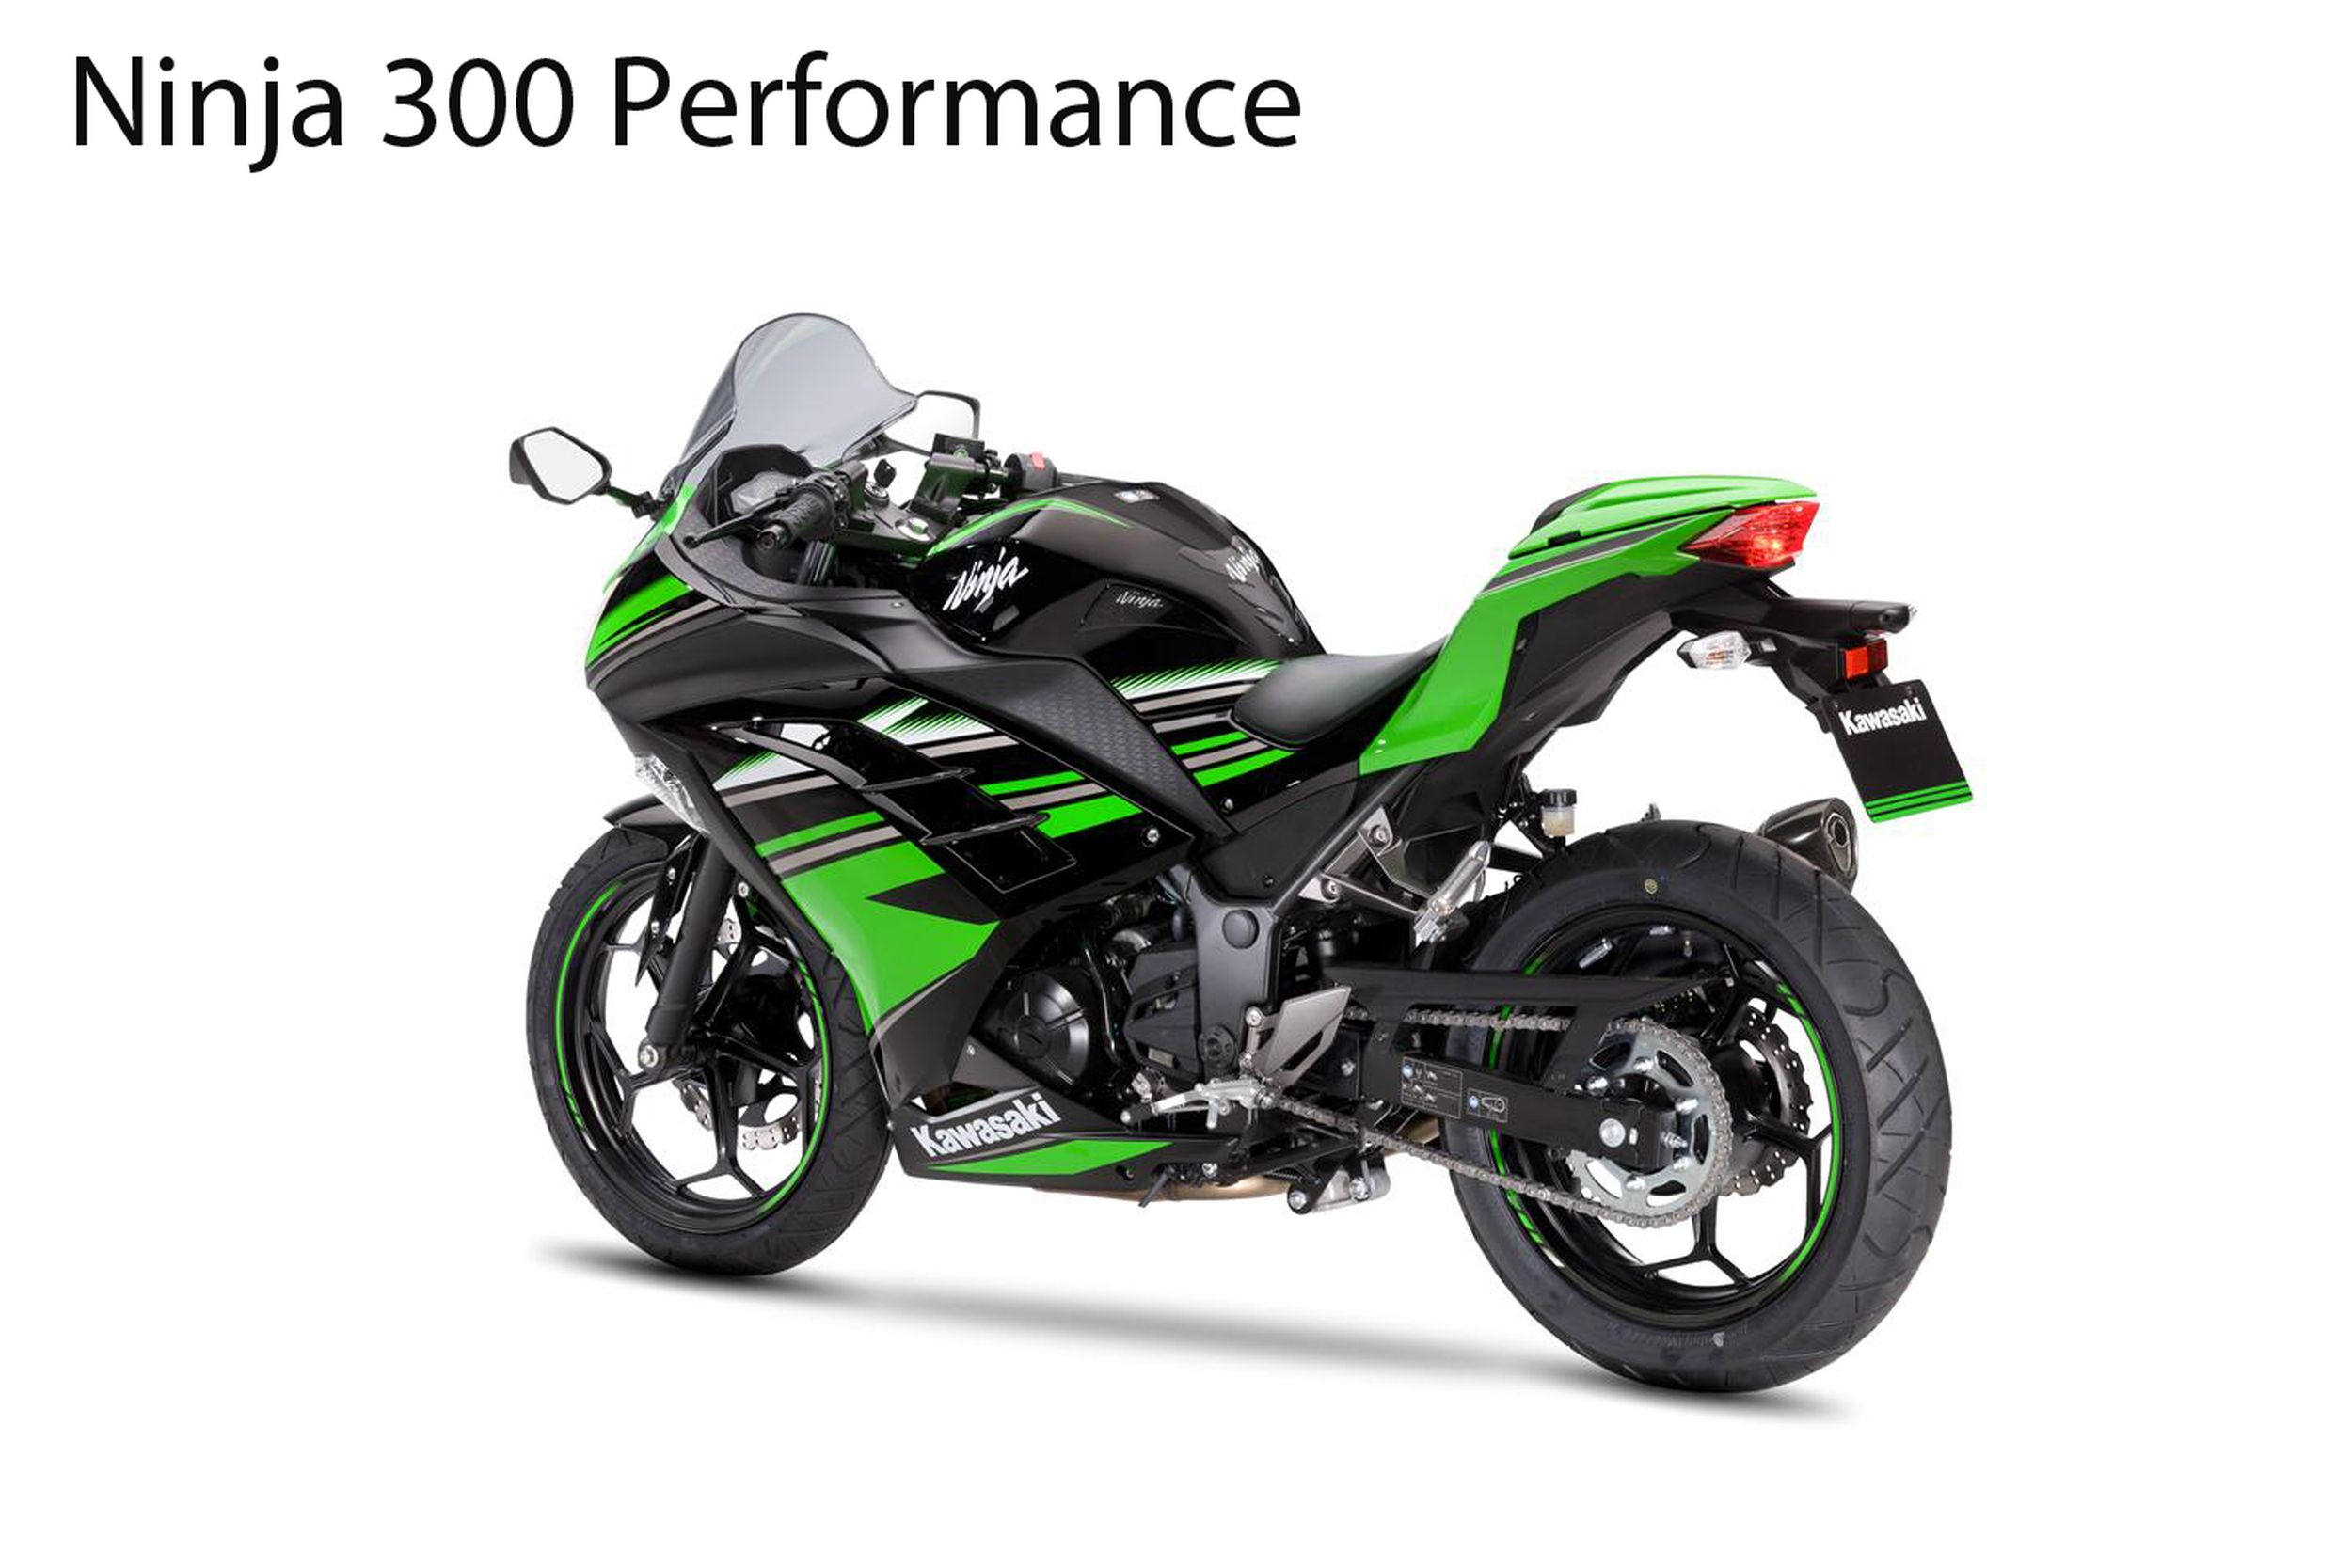 ninja 300 daten